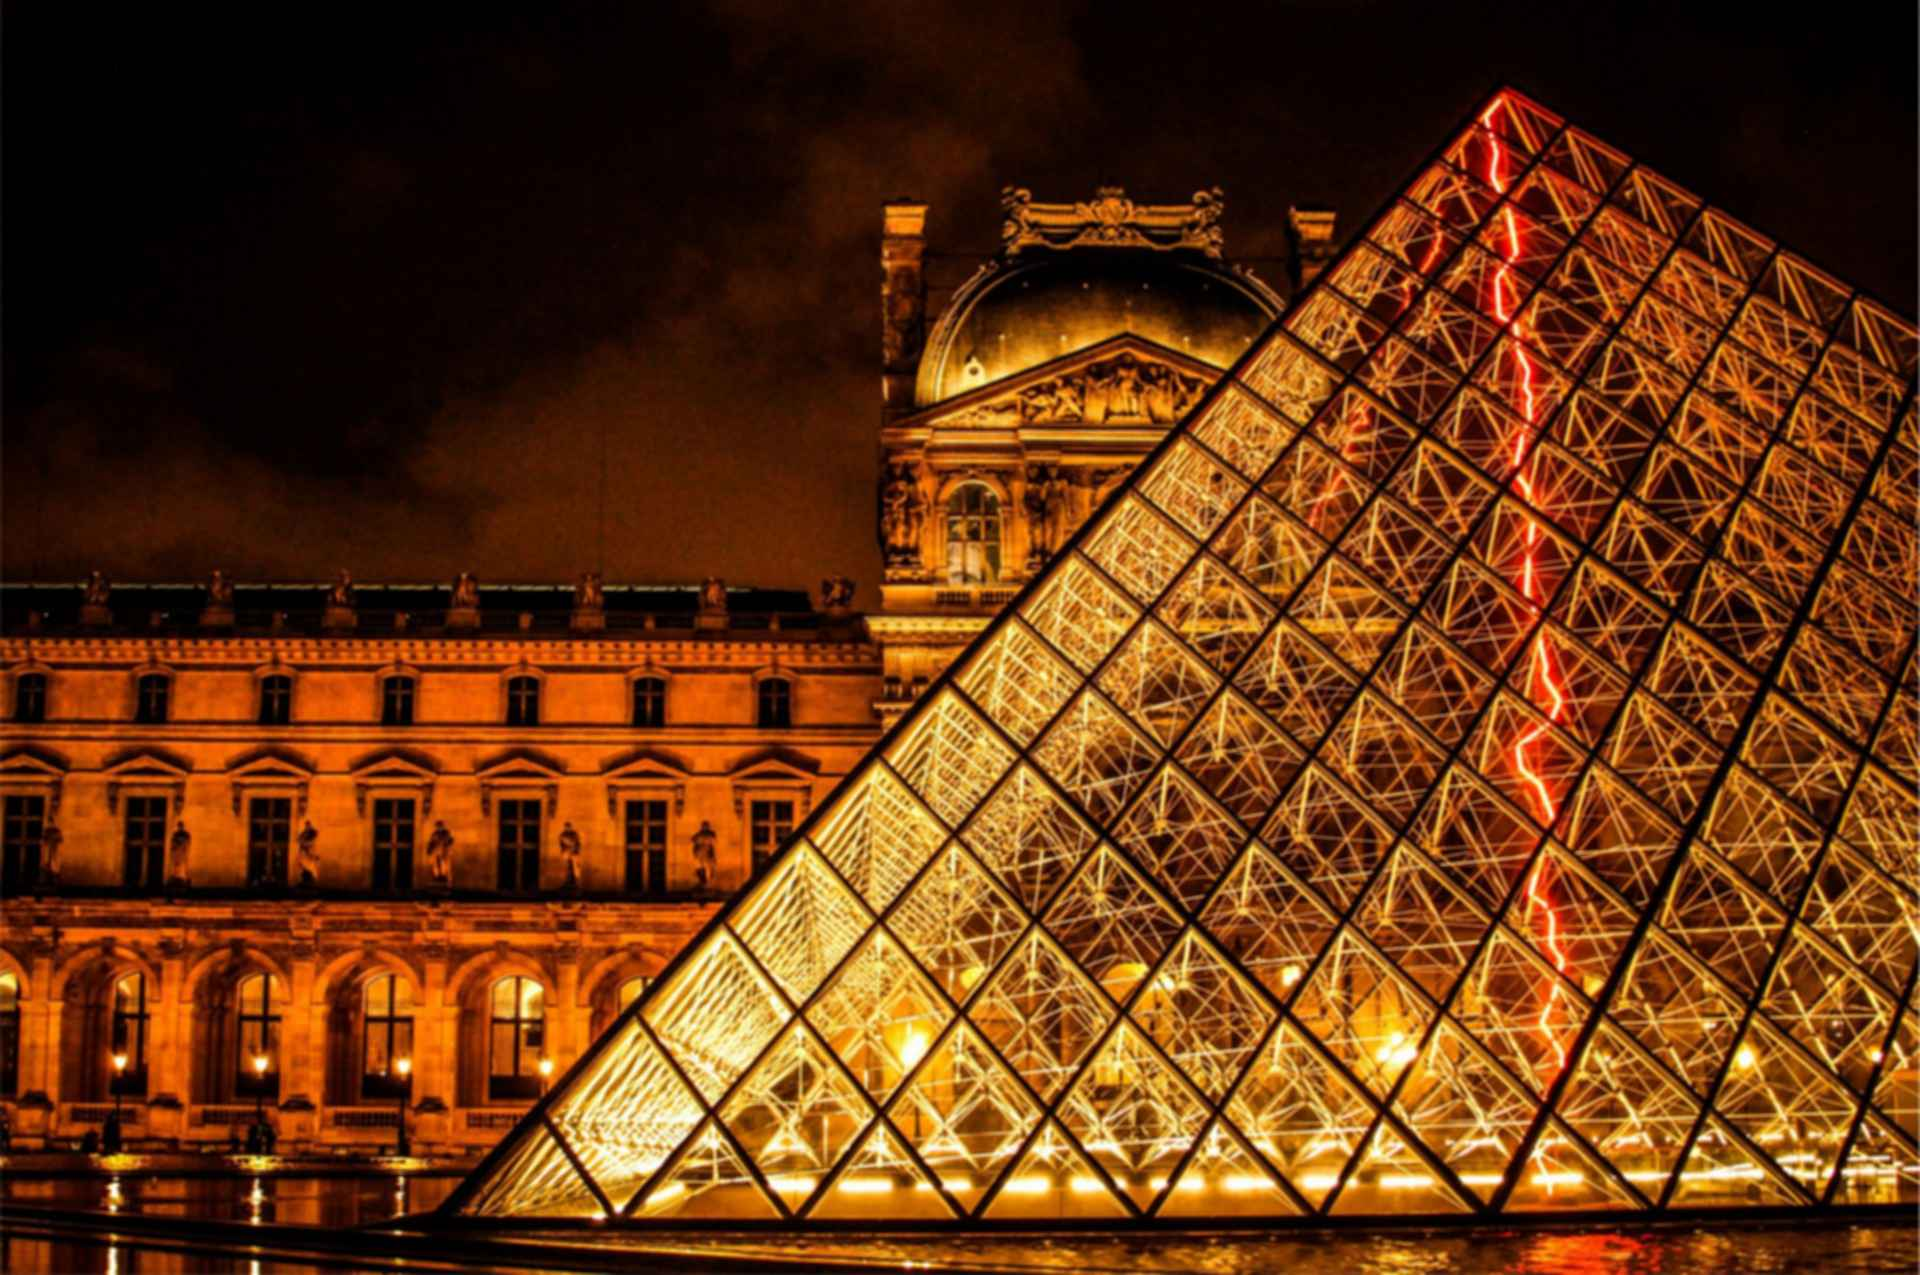 The Louvre Paris - Pyramid at Night